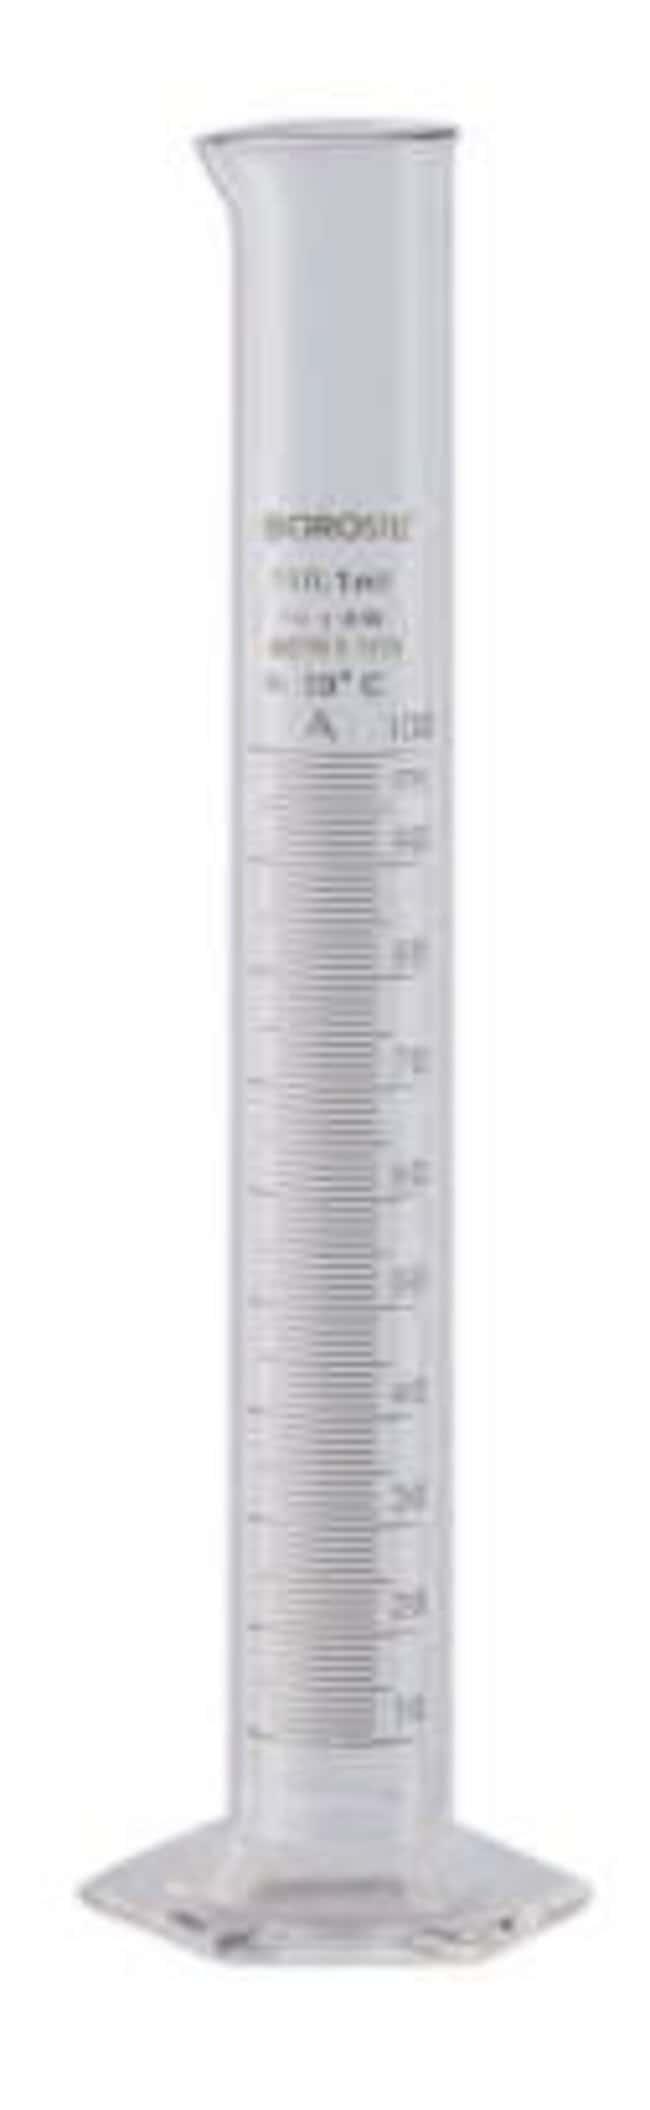 Foxx Life Sciences Borosil(T) Class B TC Graduated Measuring Cylinder with